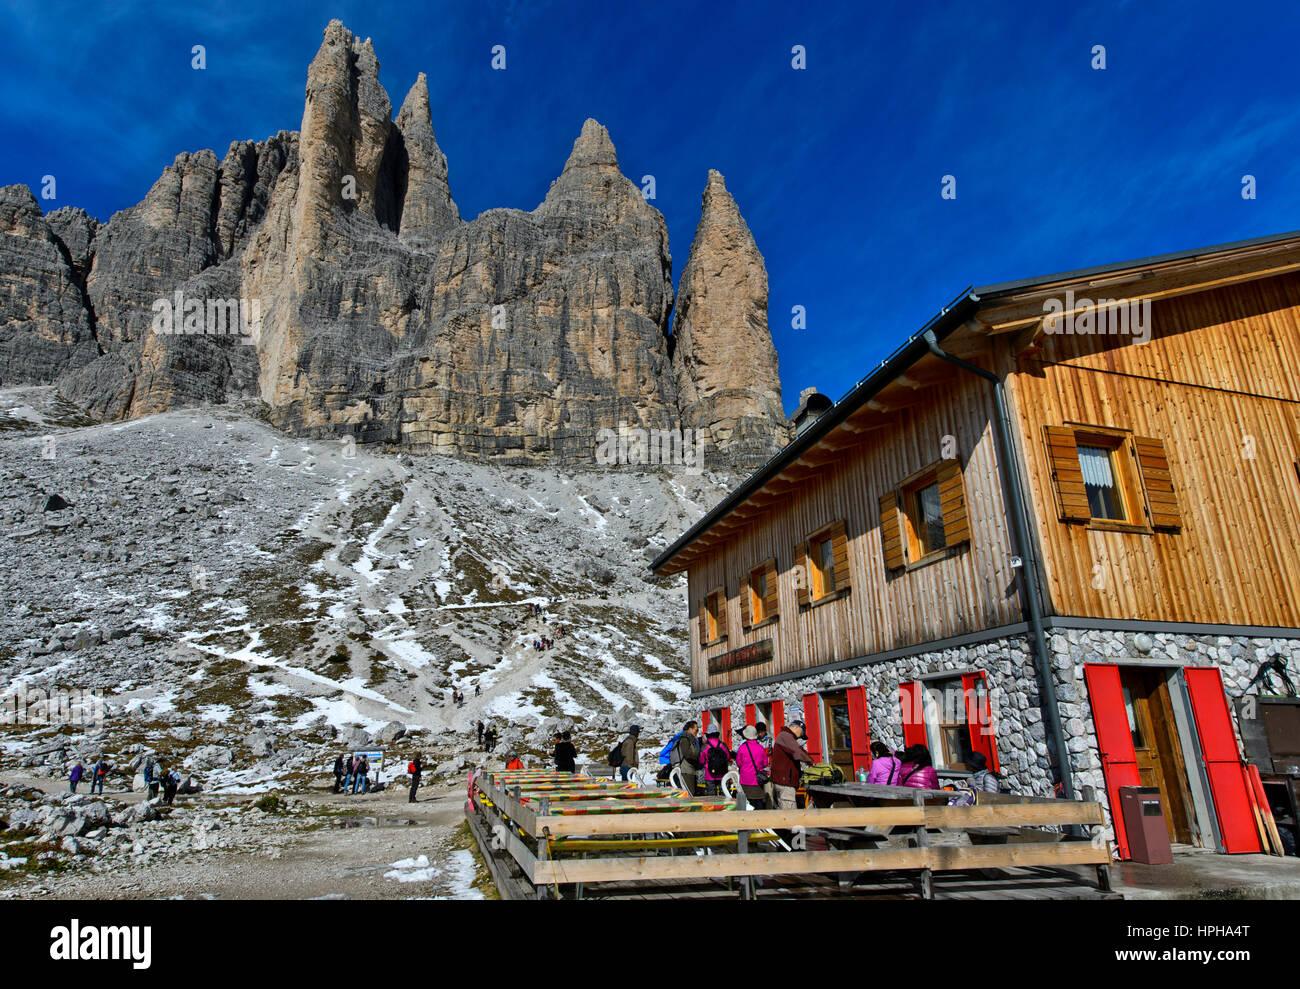 Mountain hut Rifugio Lavaredo at the foot of the Three Peaks Mountains, Sexten Dolomites, South Tyrol, Trentino - Stock Image